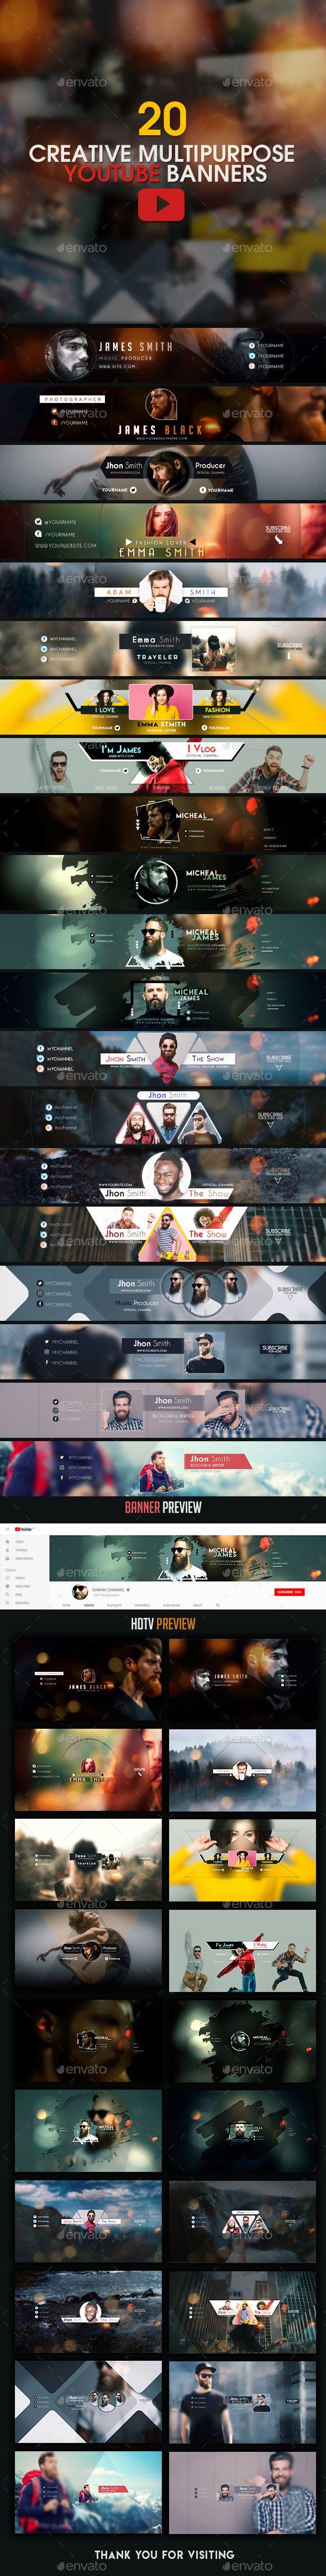 20 best youtube gaming banner templates – Artofit